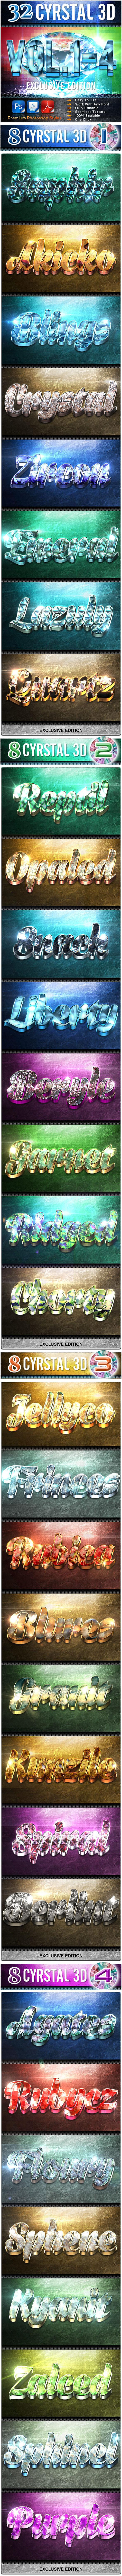 GraphicRiver 32 Cyrstal 3D Bundle Vol.1-4 9615706